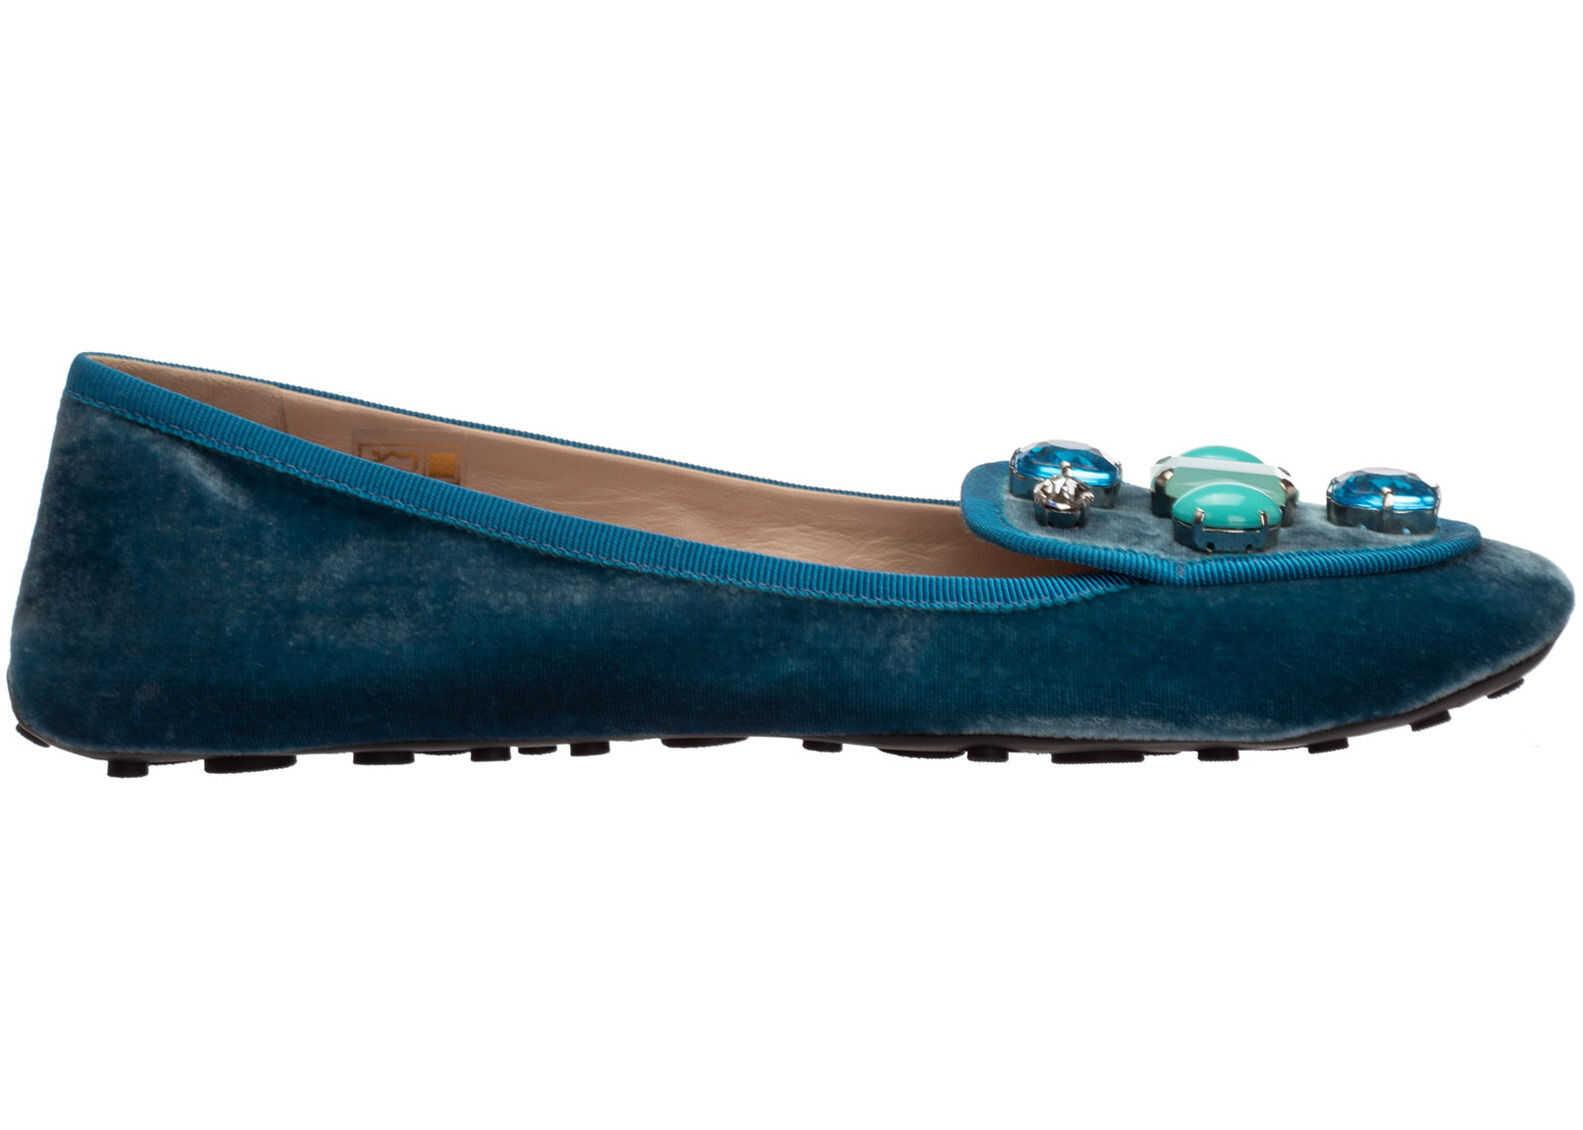 Car Shoe Flats Ballerinas KDD70OLSZF0013 Light blue imagine b-mall.ro